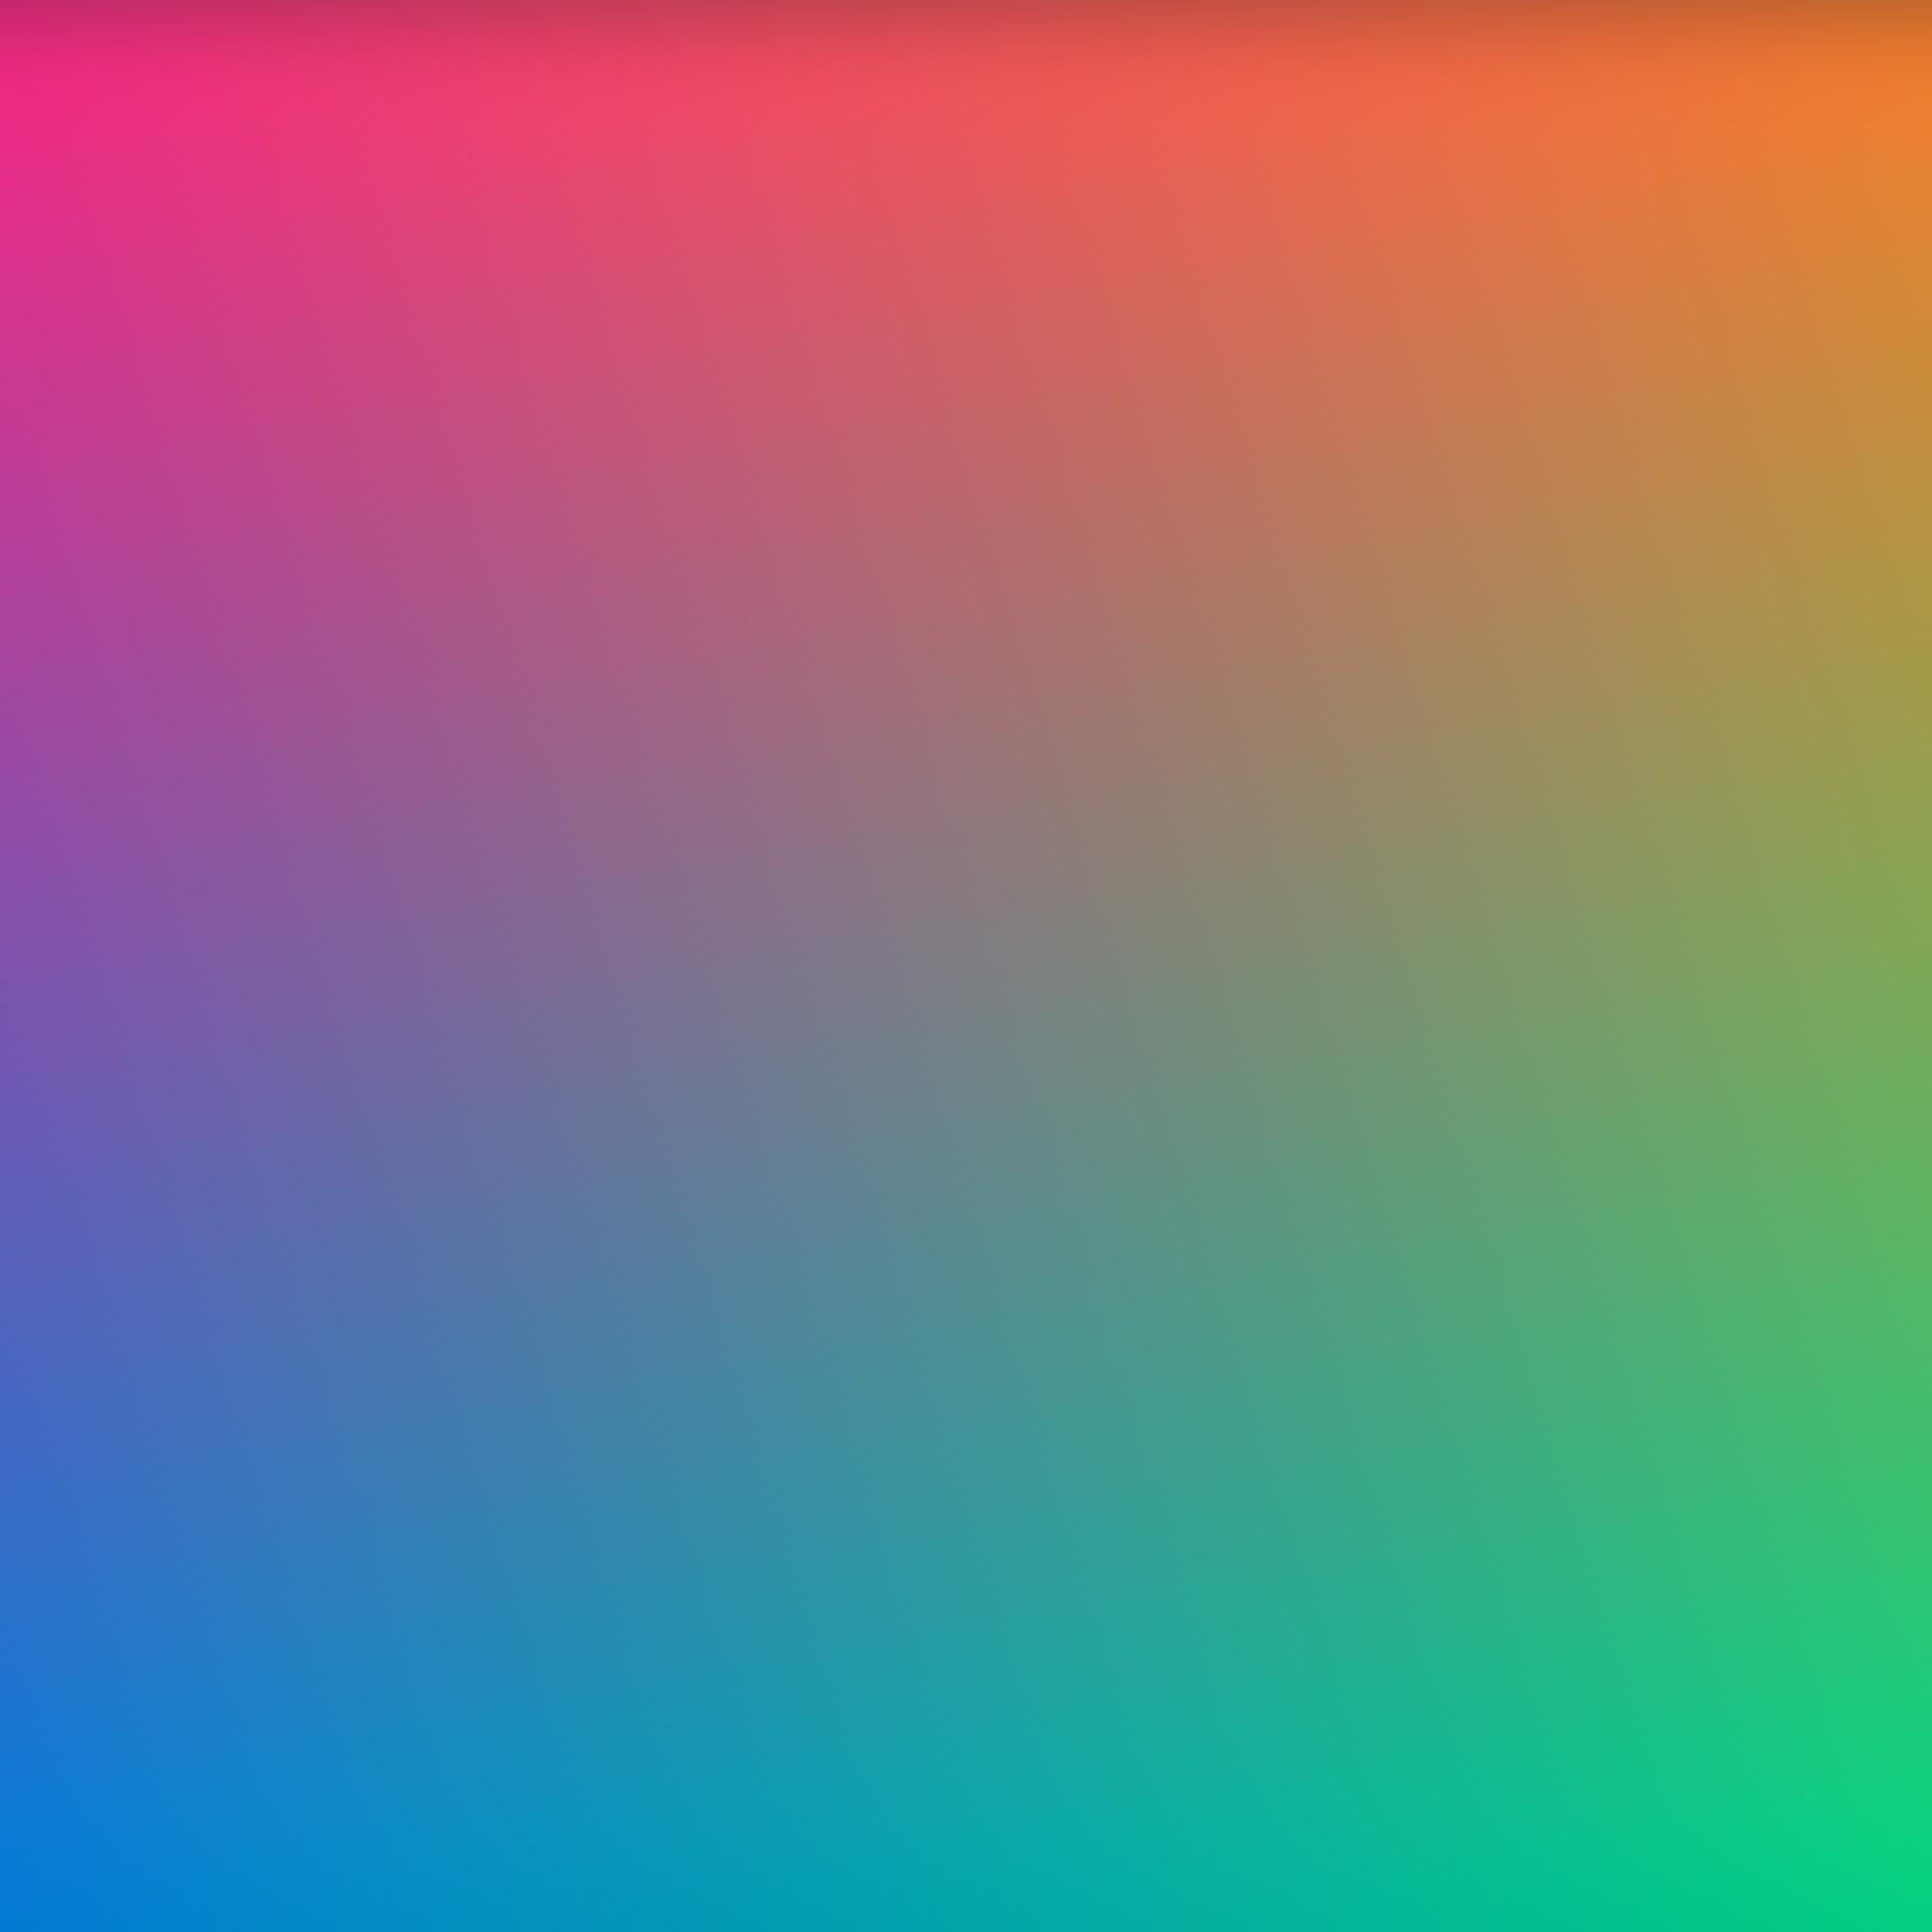 color gradation coloring pages - photo#5